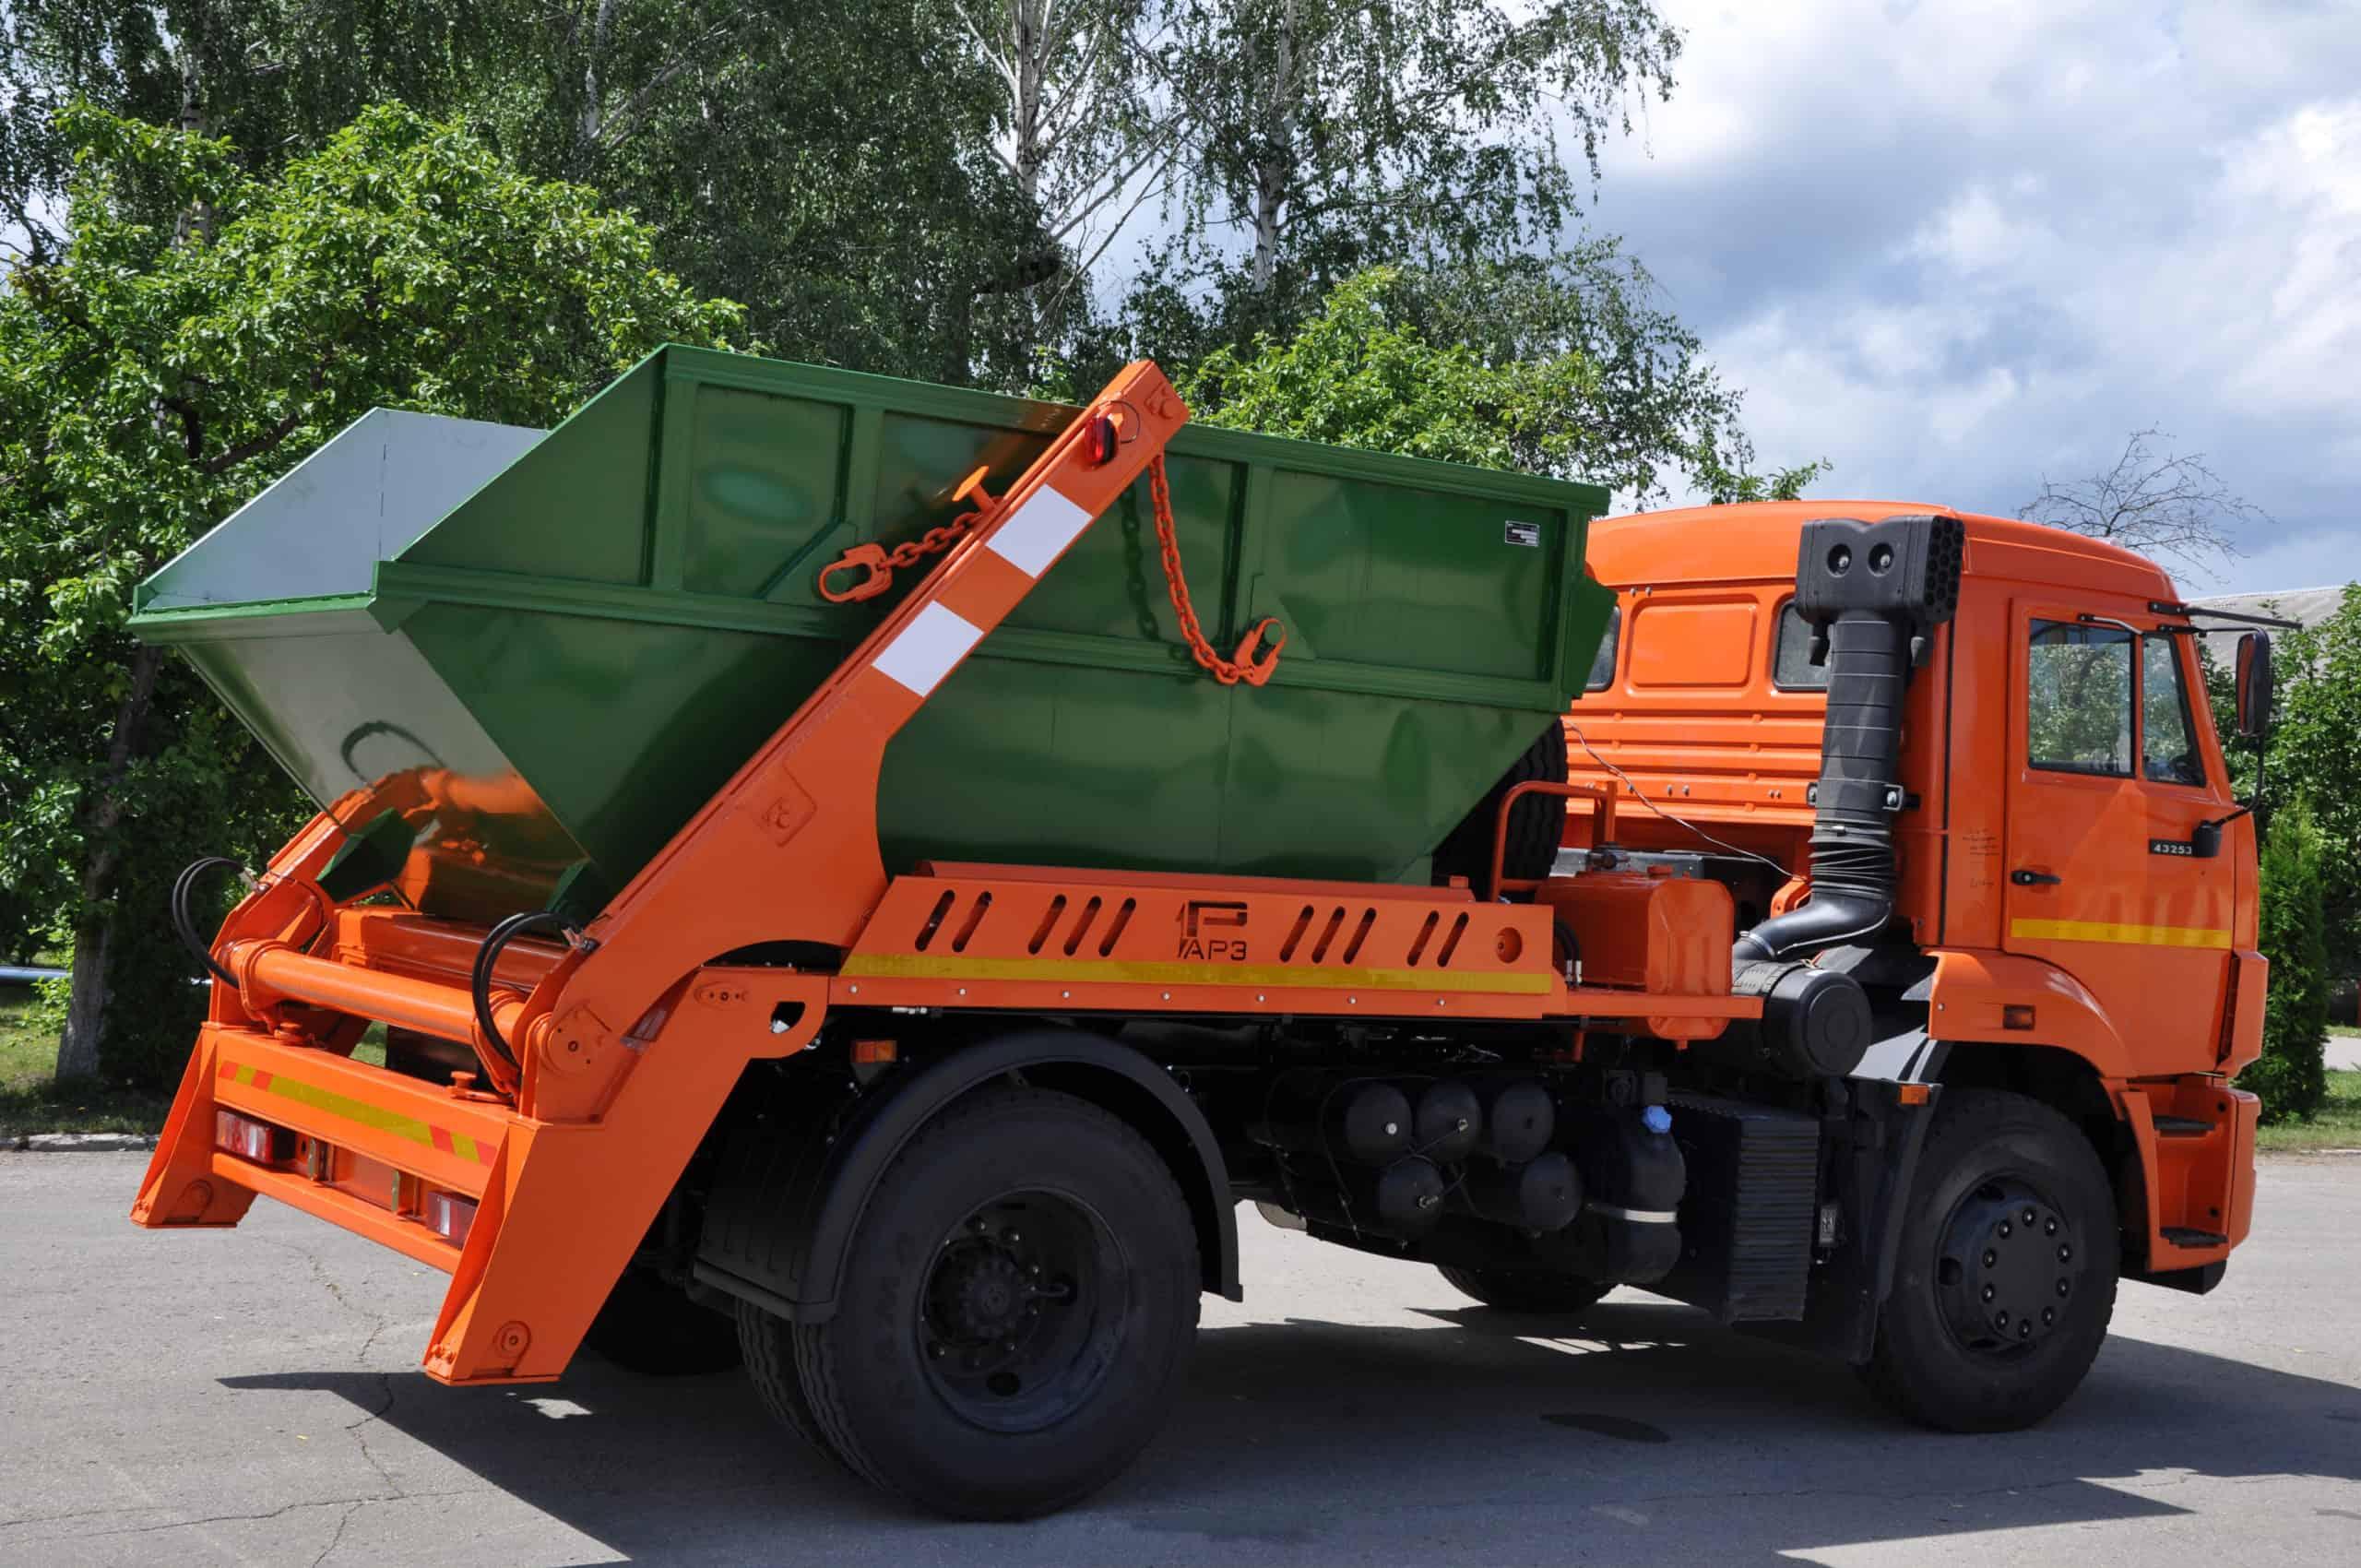 vyivoz musora konteynerom6 scaled - Вывоз мусора контейнером